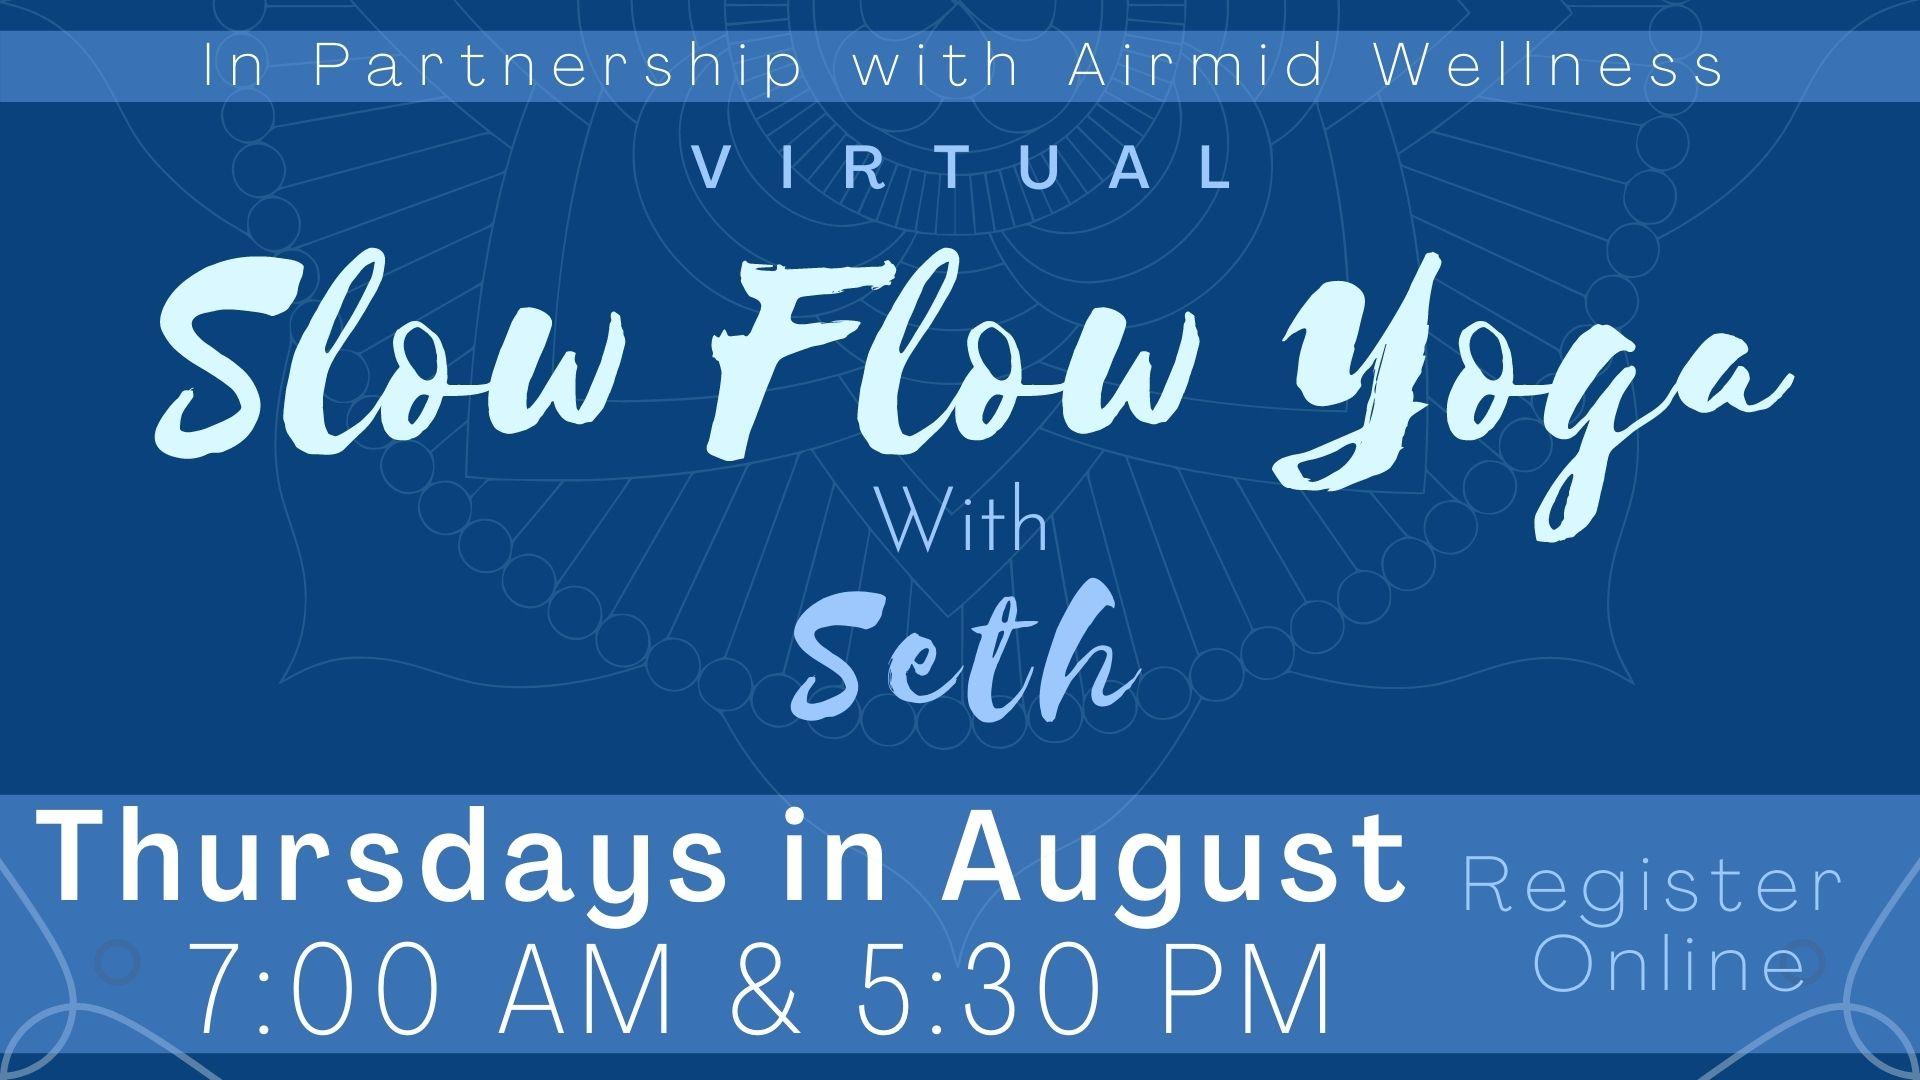 Virtual Slow Flow Yoga with Seth